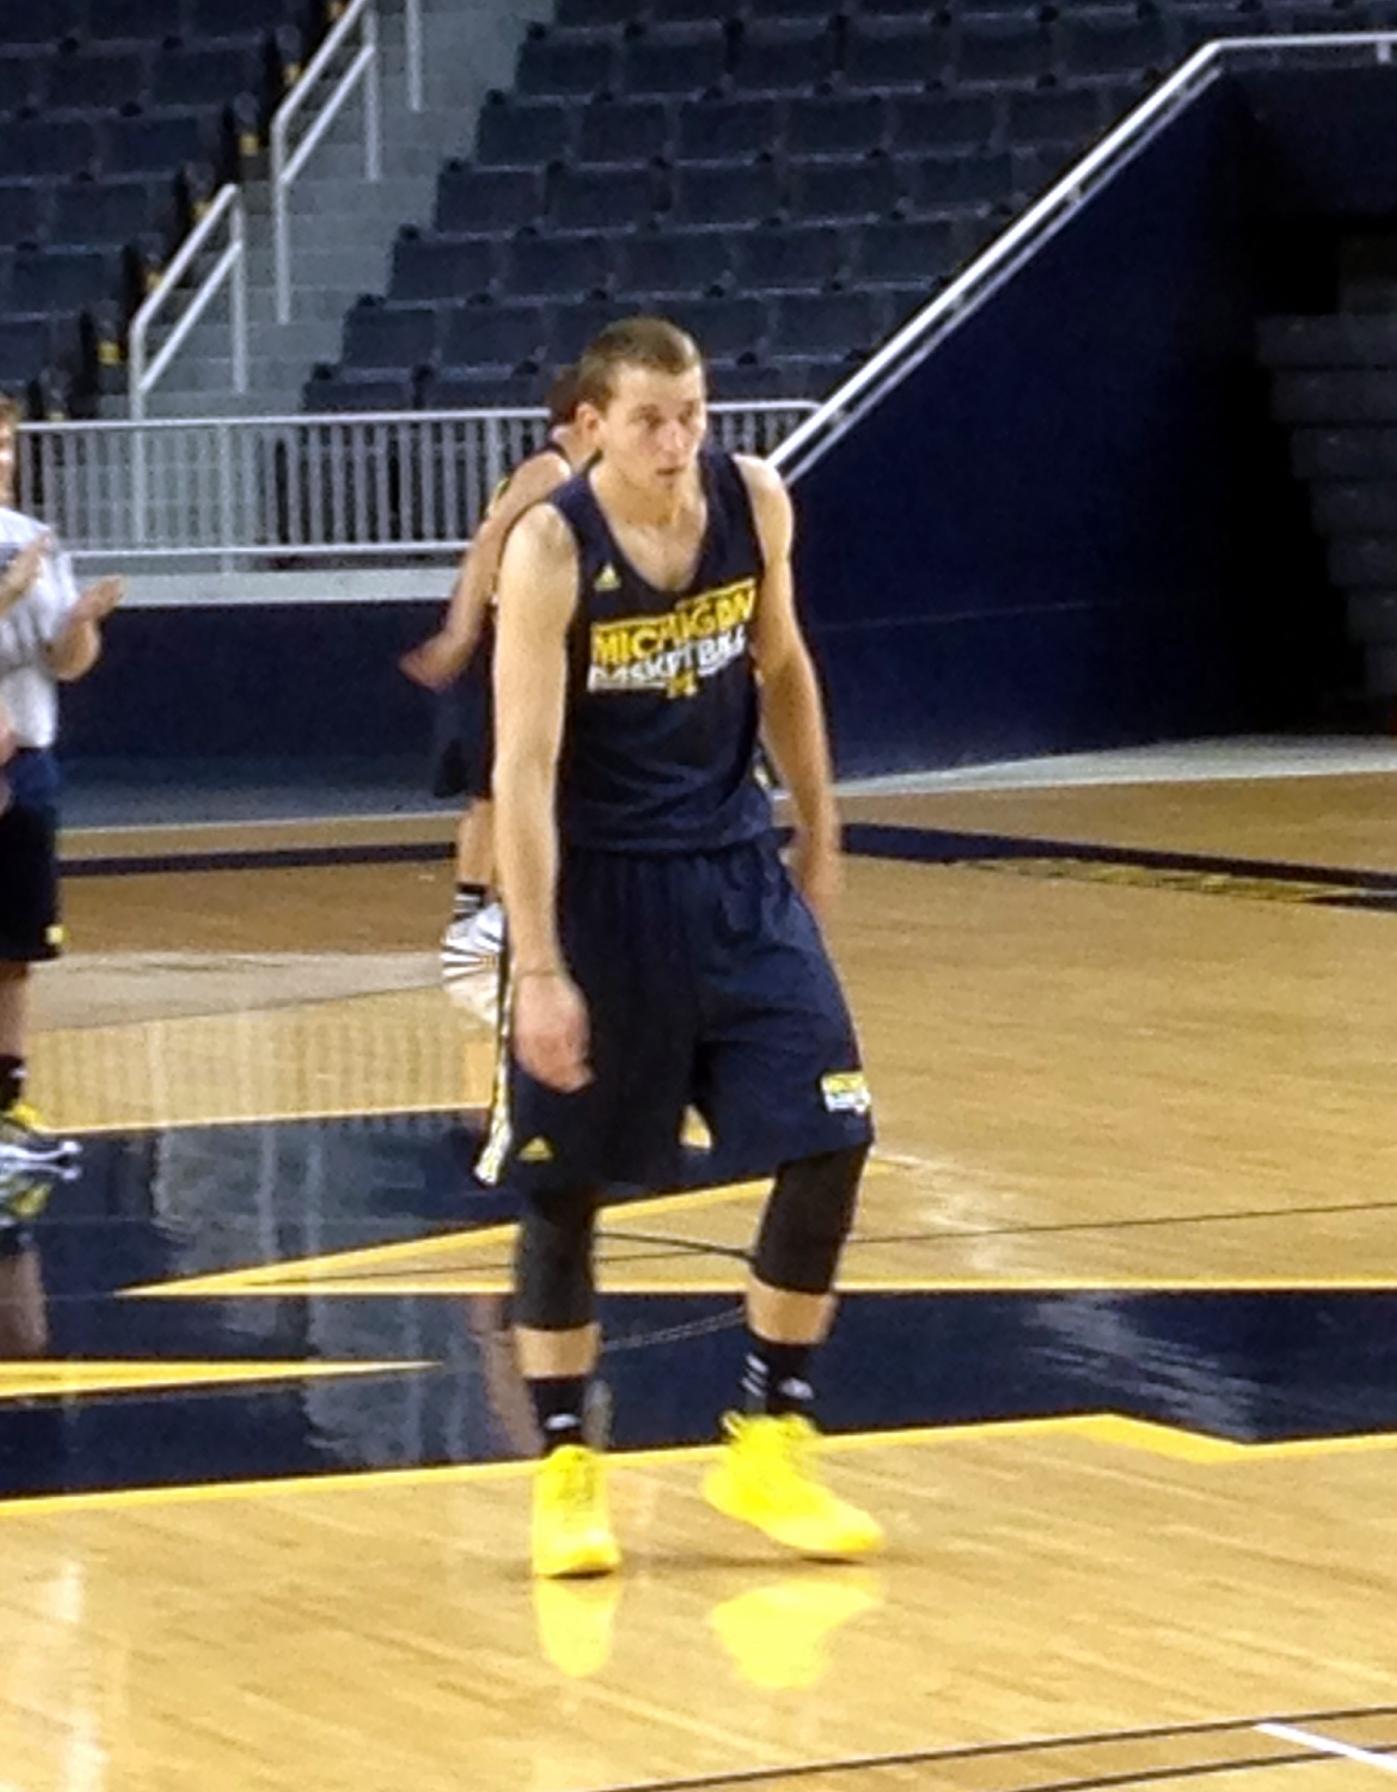 Michigan First Practice – 7